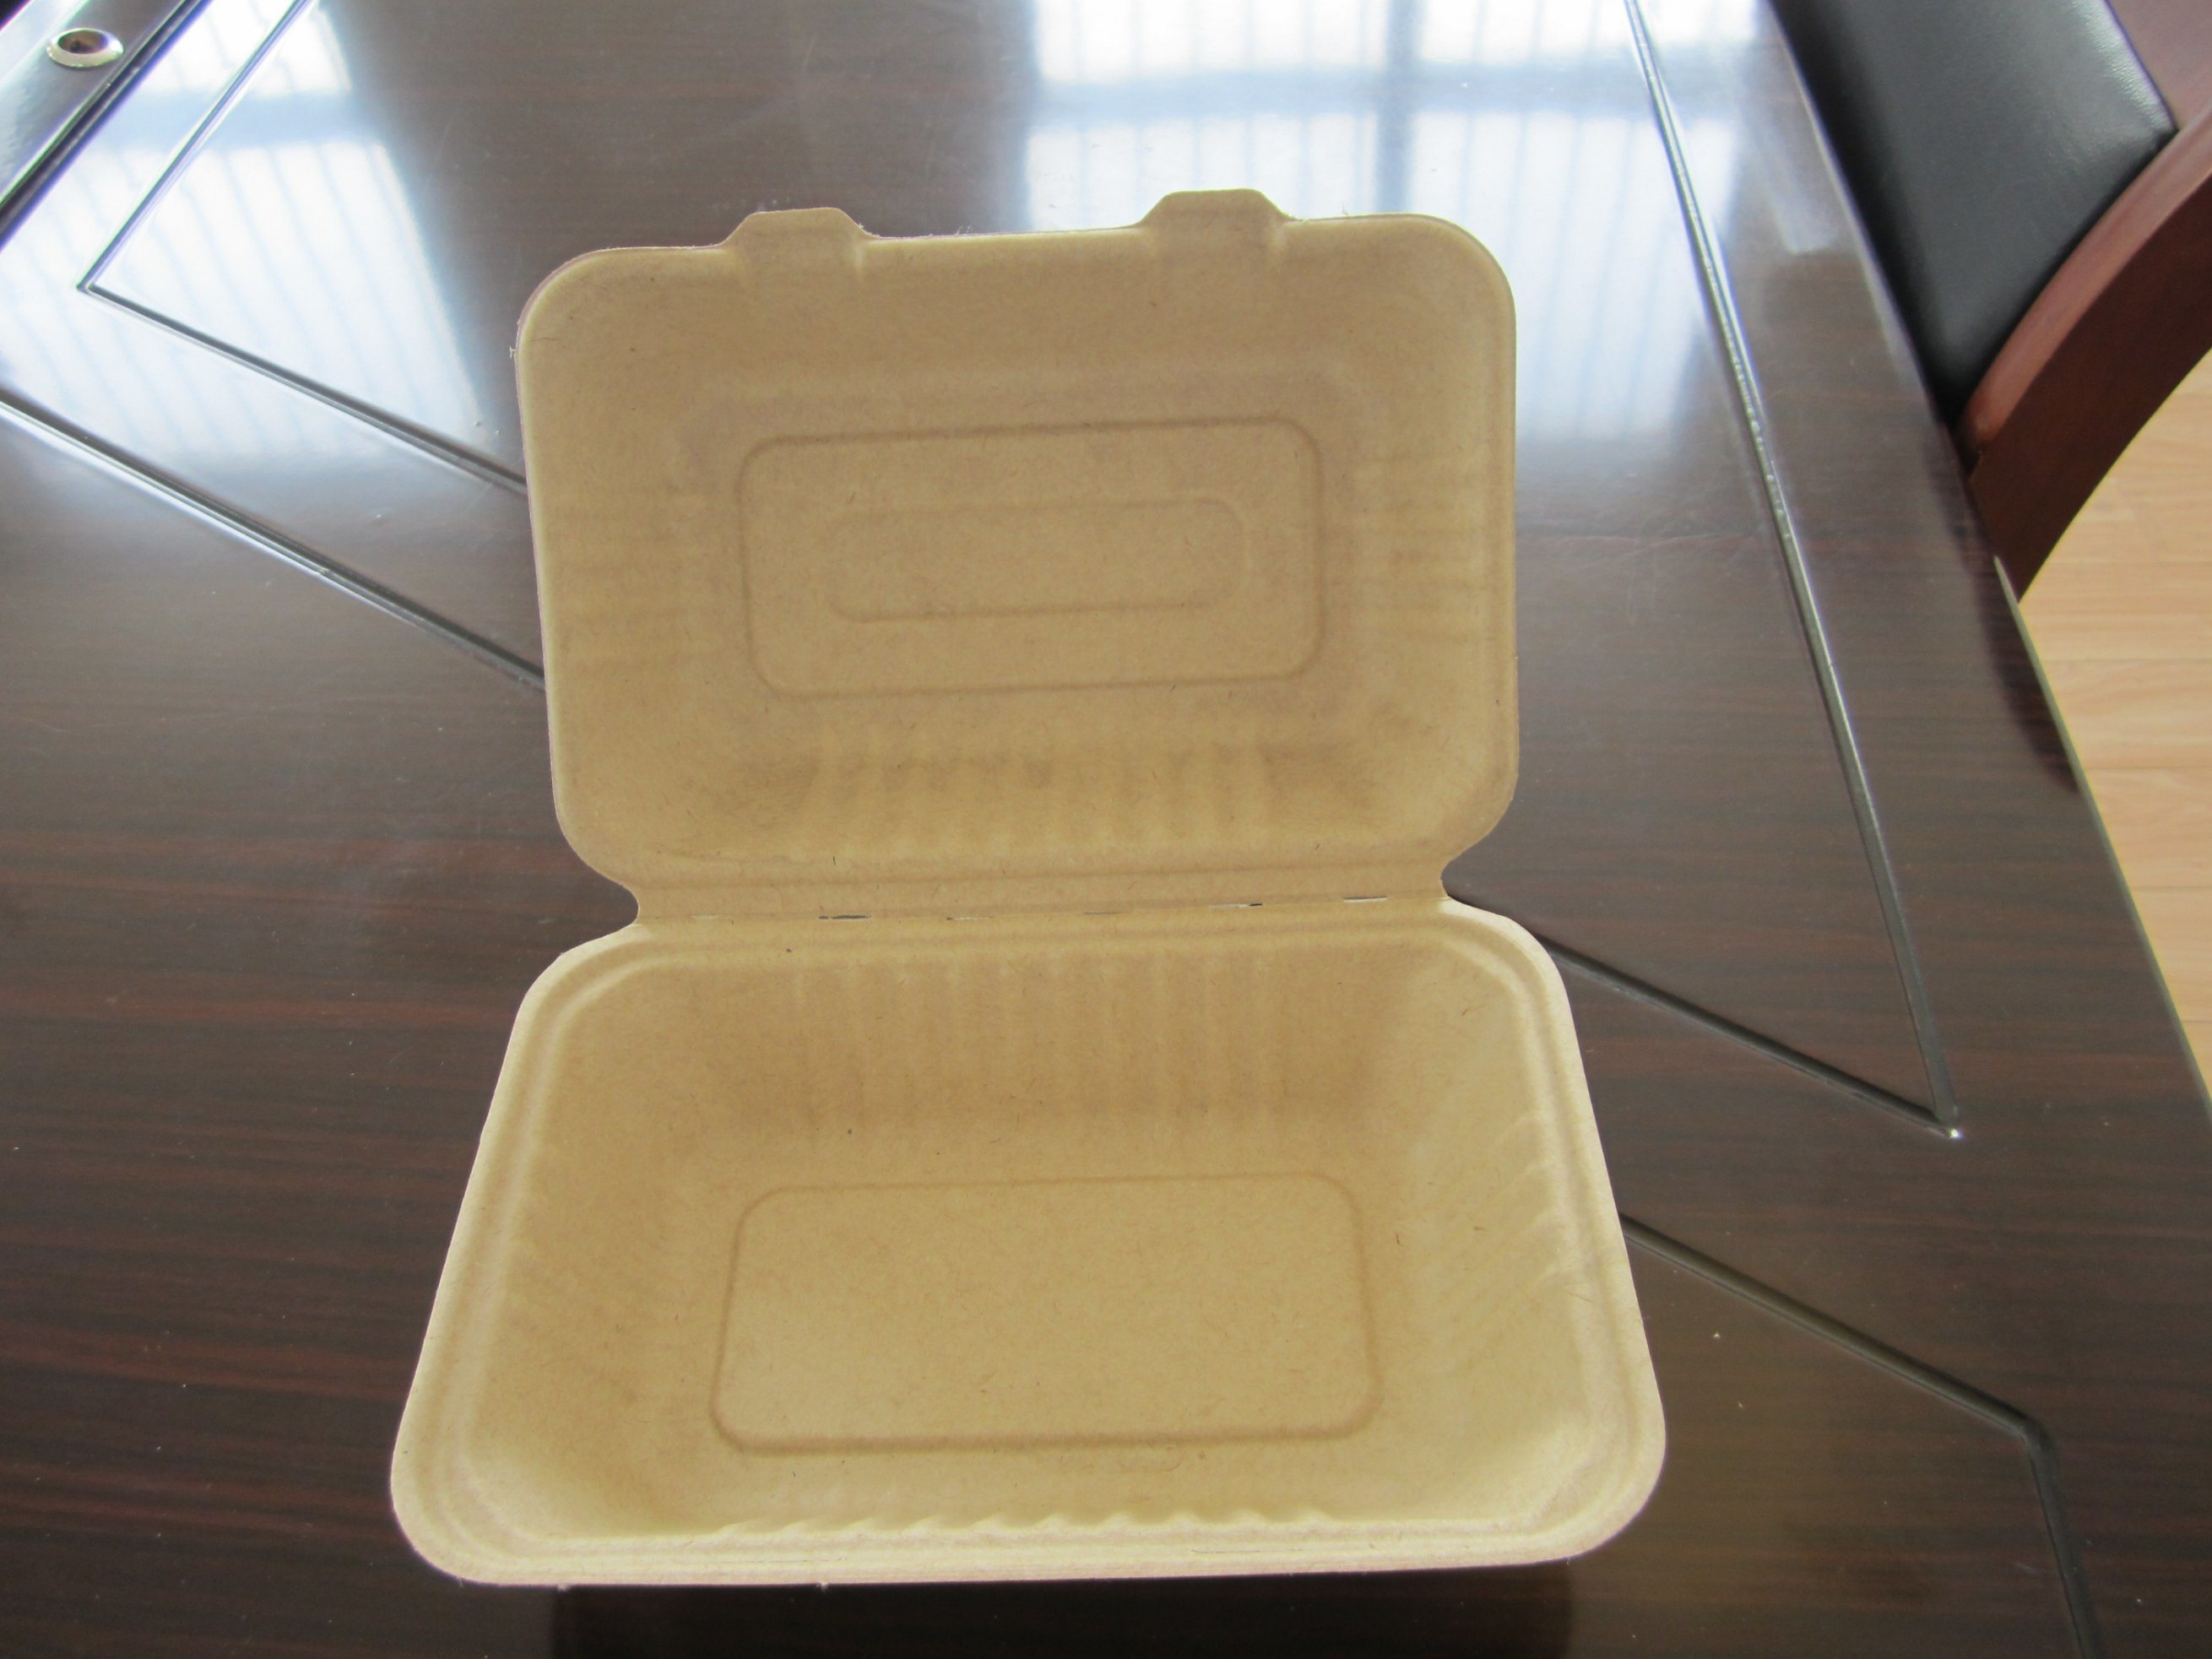 Biodegradable Sugarcane Clamshell for Hamburger